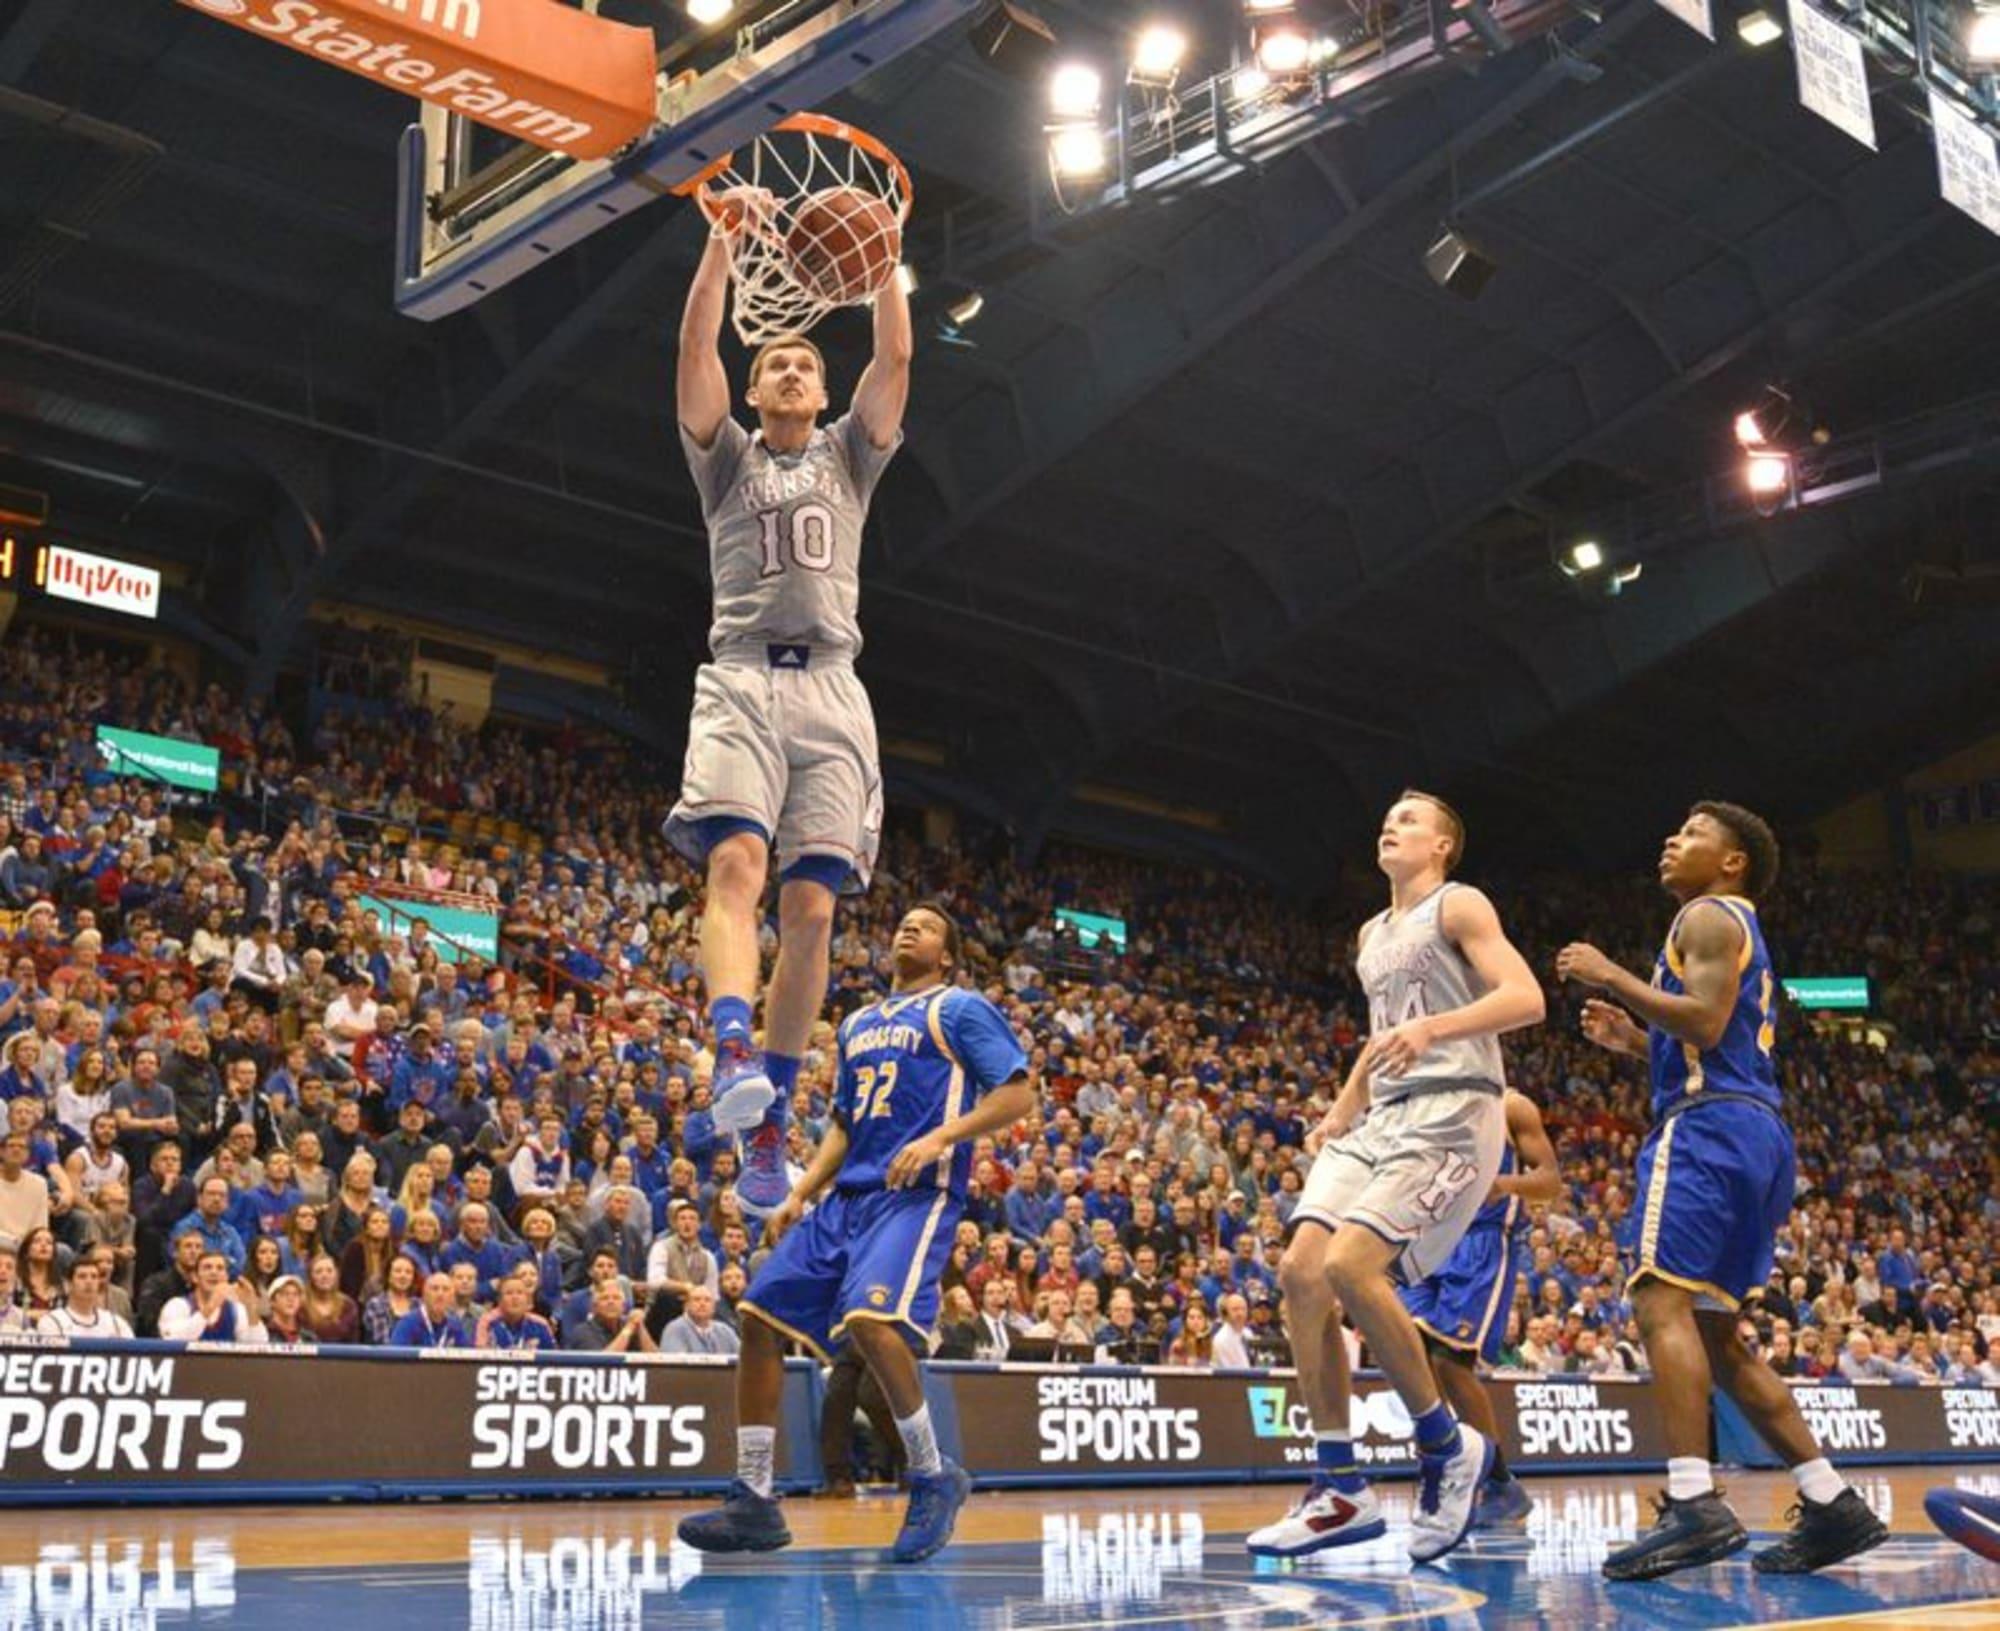 Baskettball Live